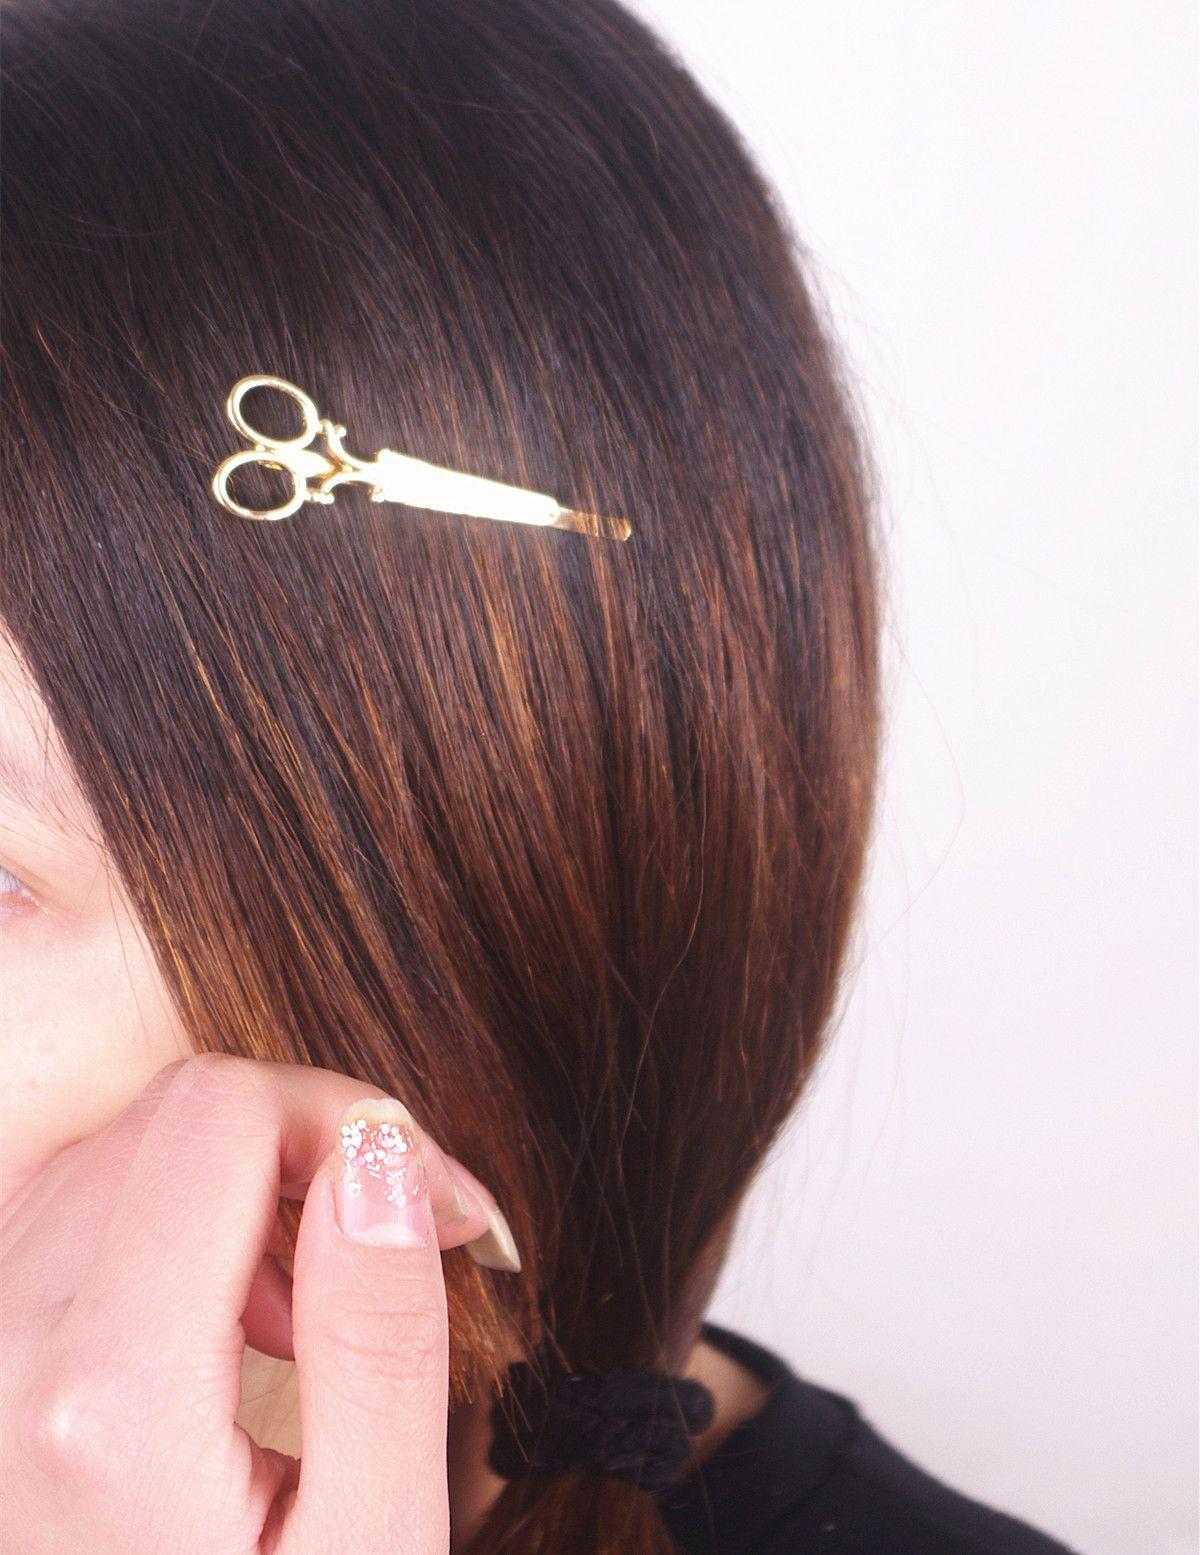 Europa Designer de Jóias Grampos de Cabelo de Ouro Tesoura de Prata Grampo de Cabelo Para O Cabelo Tiara Barrettes Mulheres Acessórios Para o Cabelo